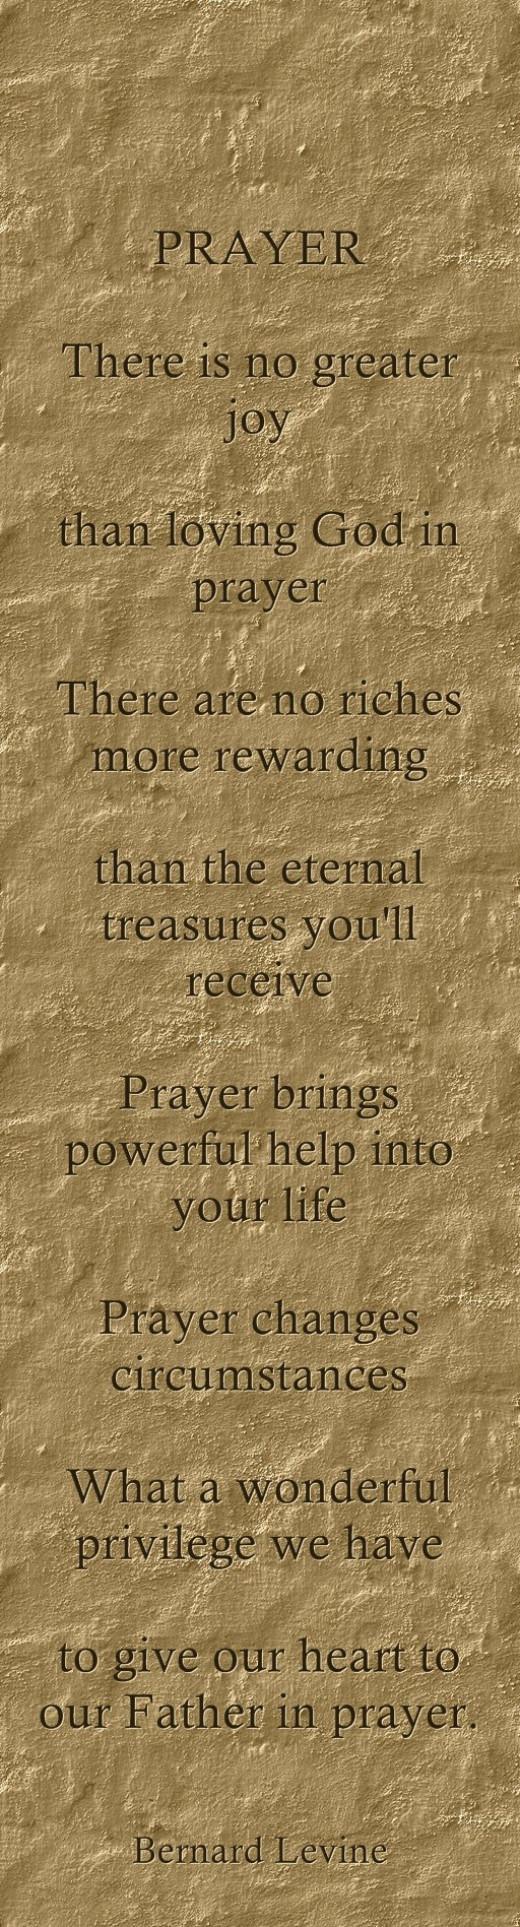 Prayer By Bernard Levine